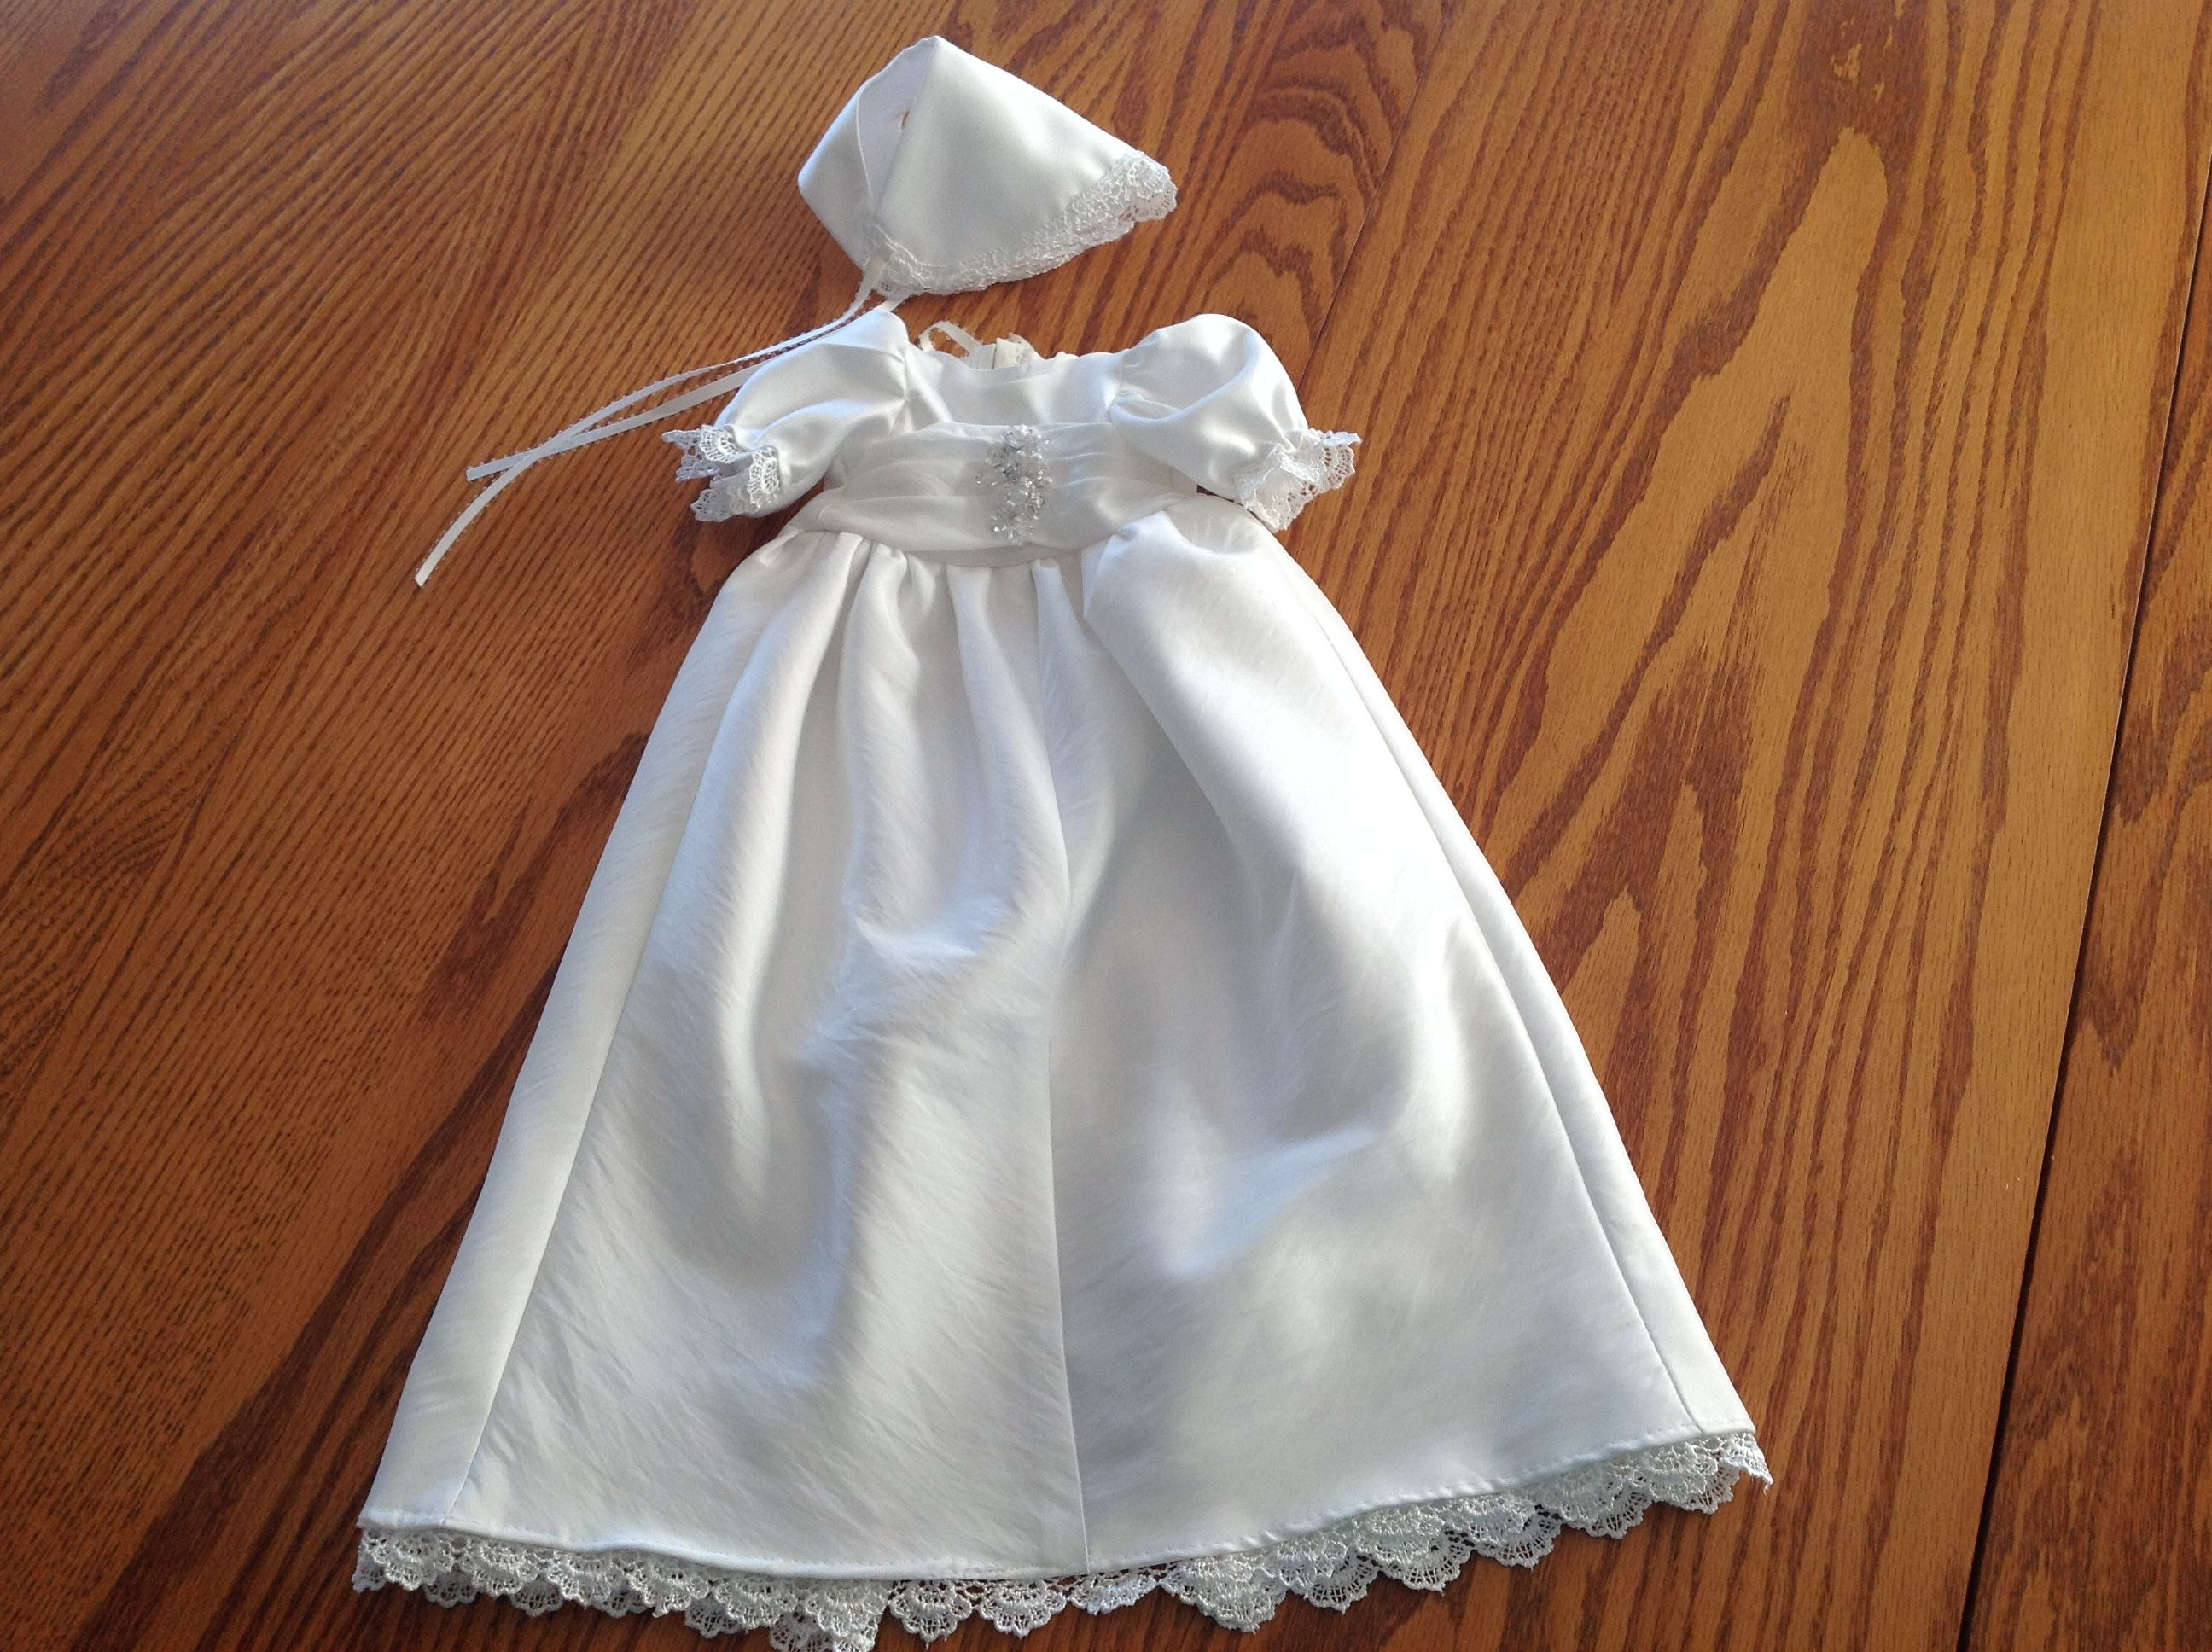 Angel gown created by Debbie Walker | Angel Gowns | Pinterest ...